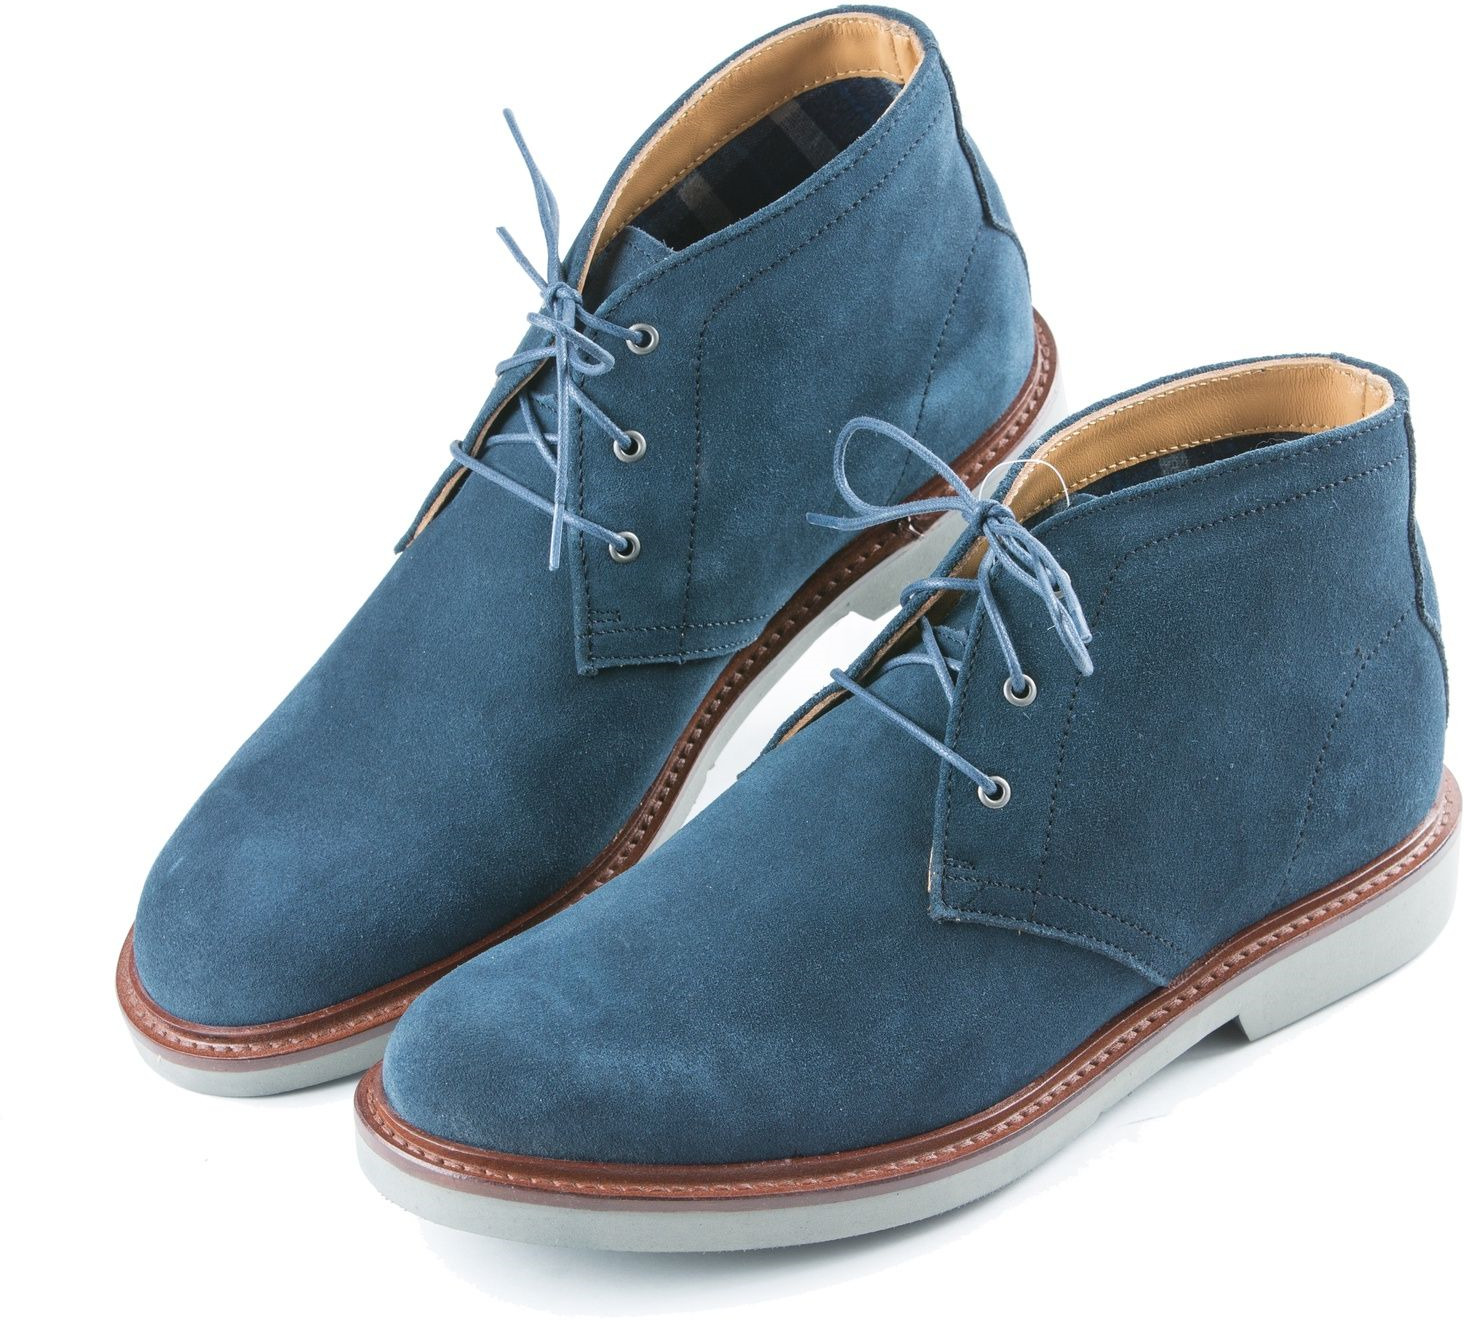 Туфли John Henry, JH02B, цвет: синий. Размер 41JH02B/Мужские туфли, натуральная замша